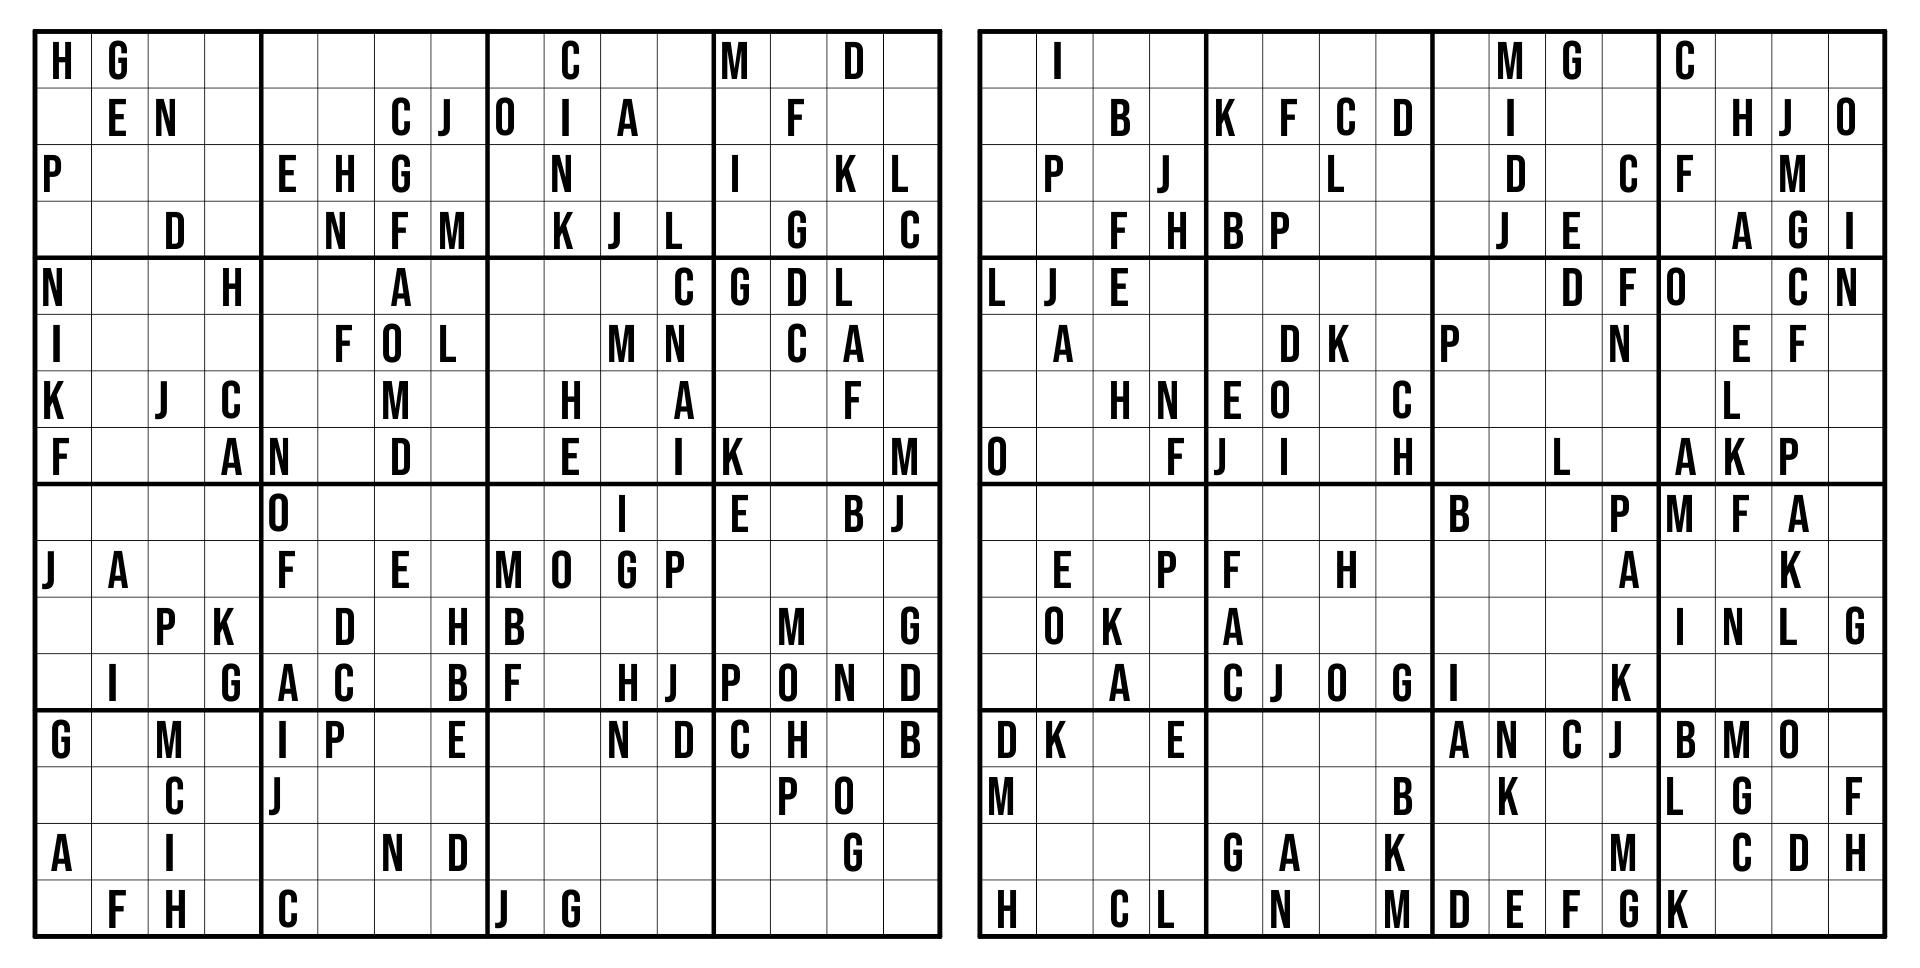 16 By 16 Sudoku Printable